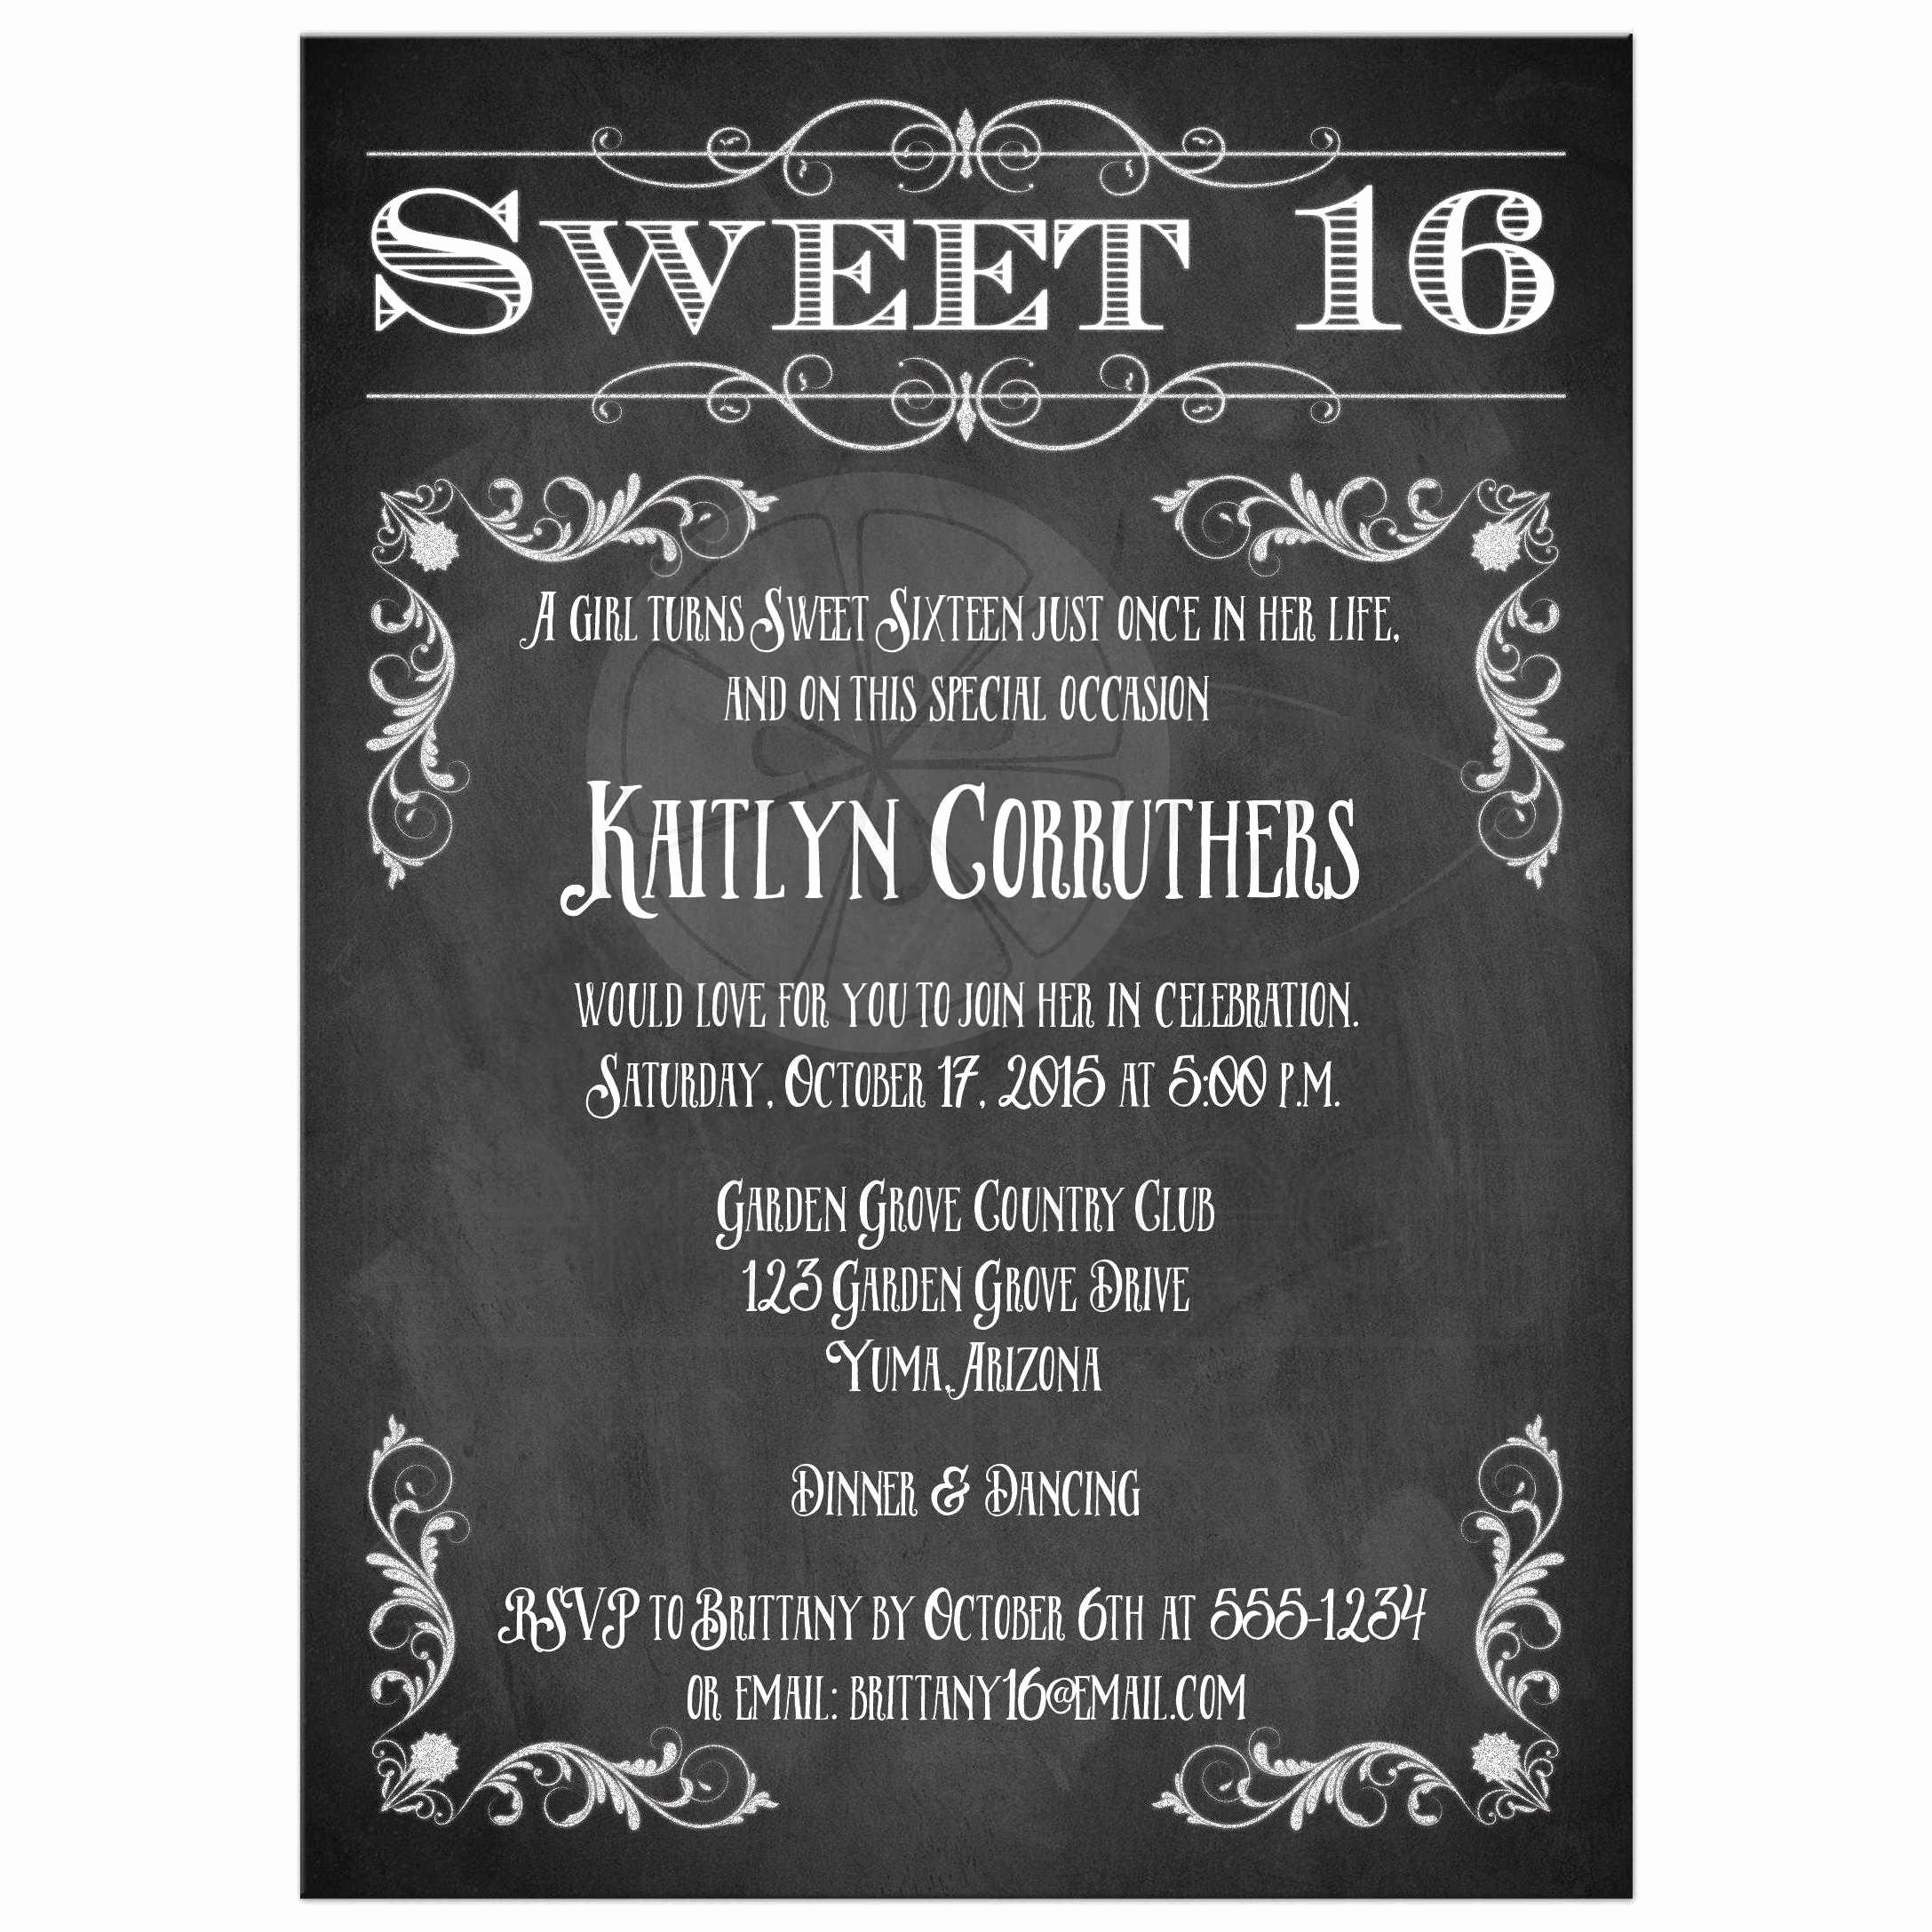 Sweet 16 Invitation Template Beautiful Free Sweet 16 Birthday Invitations – Free Printable